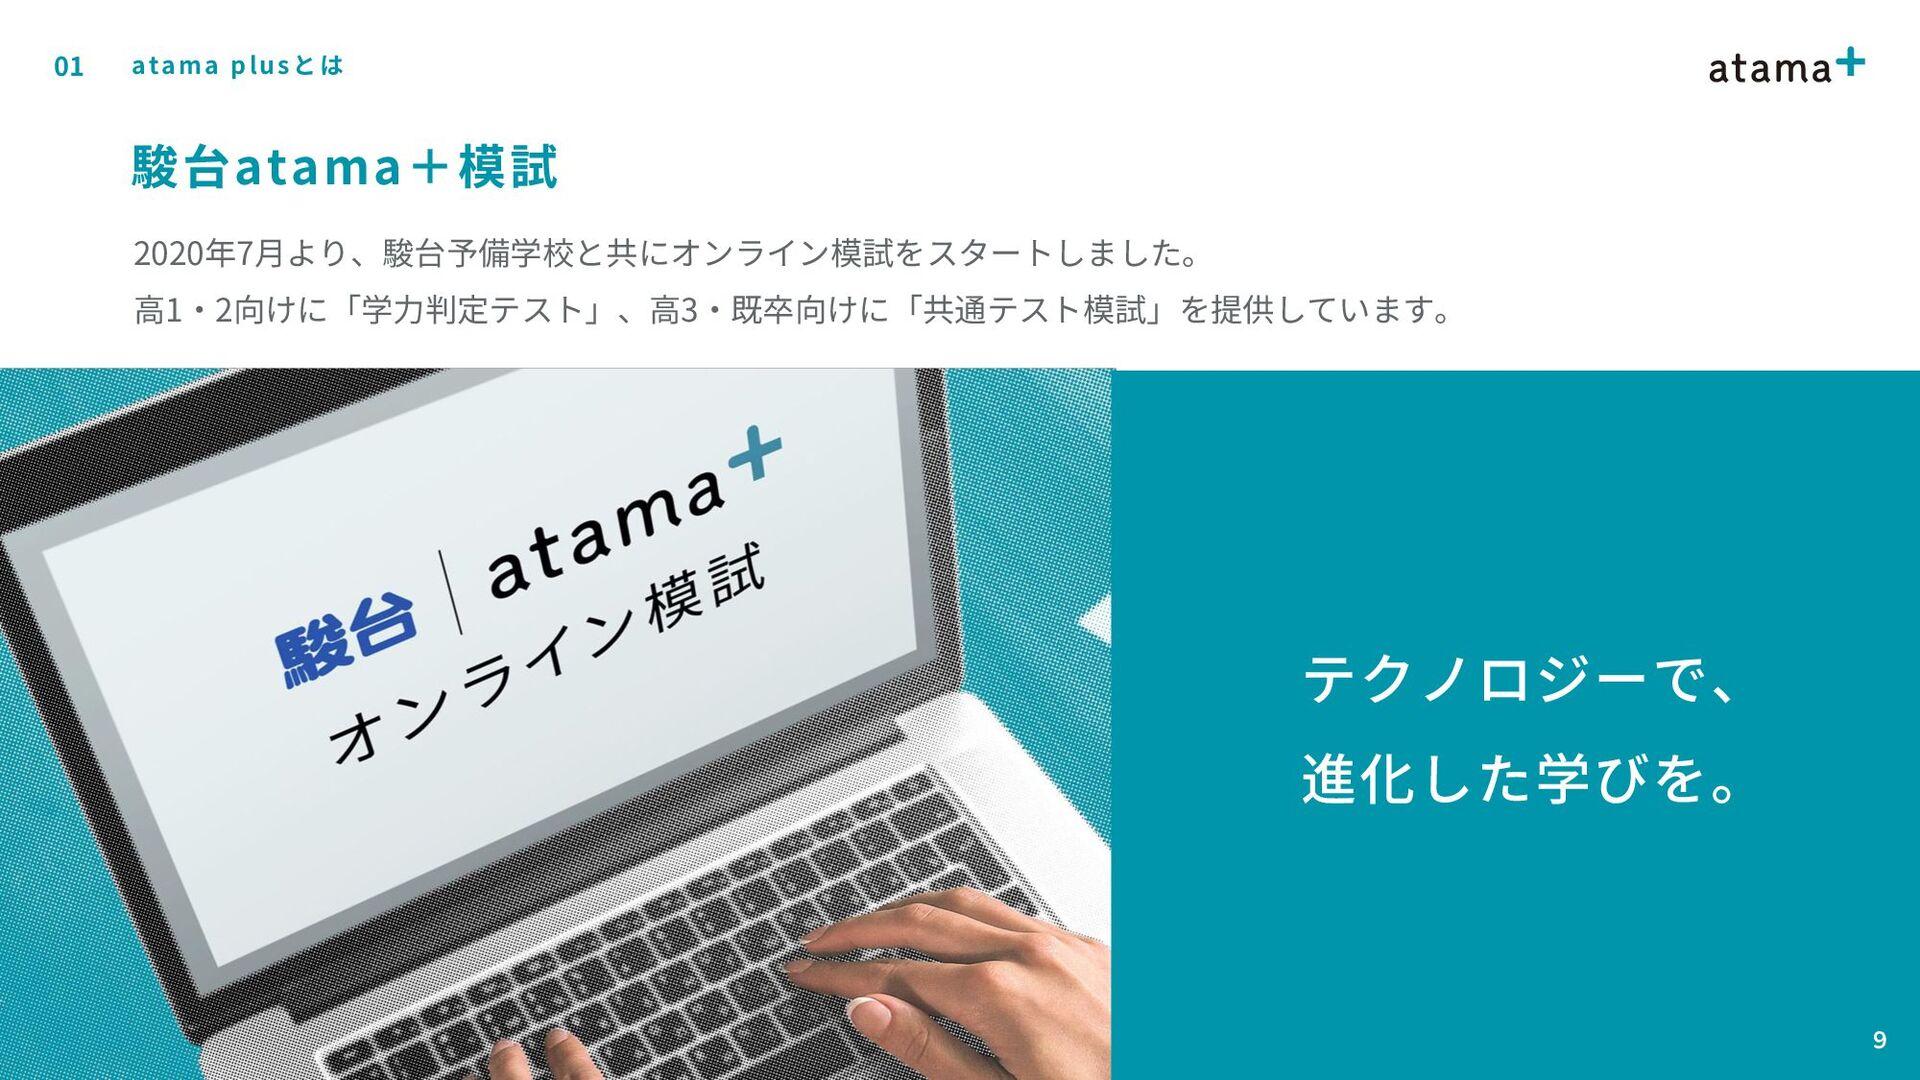 atama plusのプロダクト開発 02 9